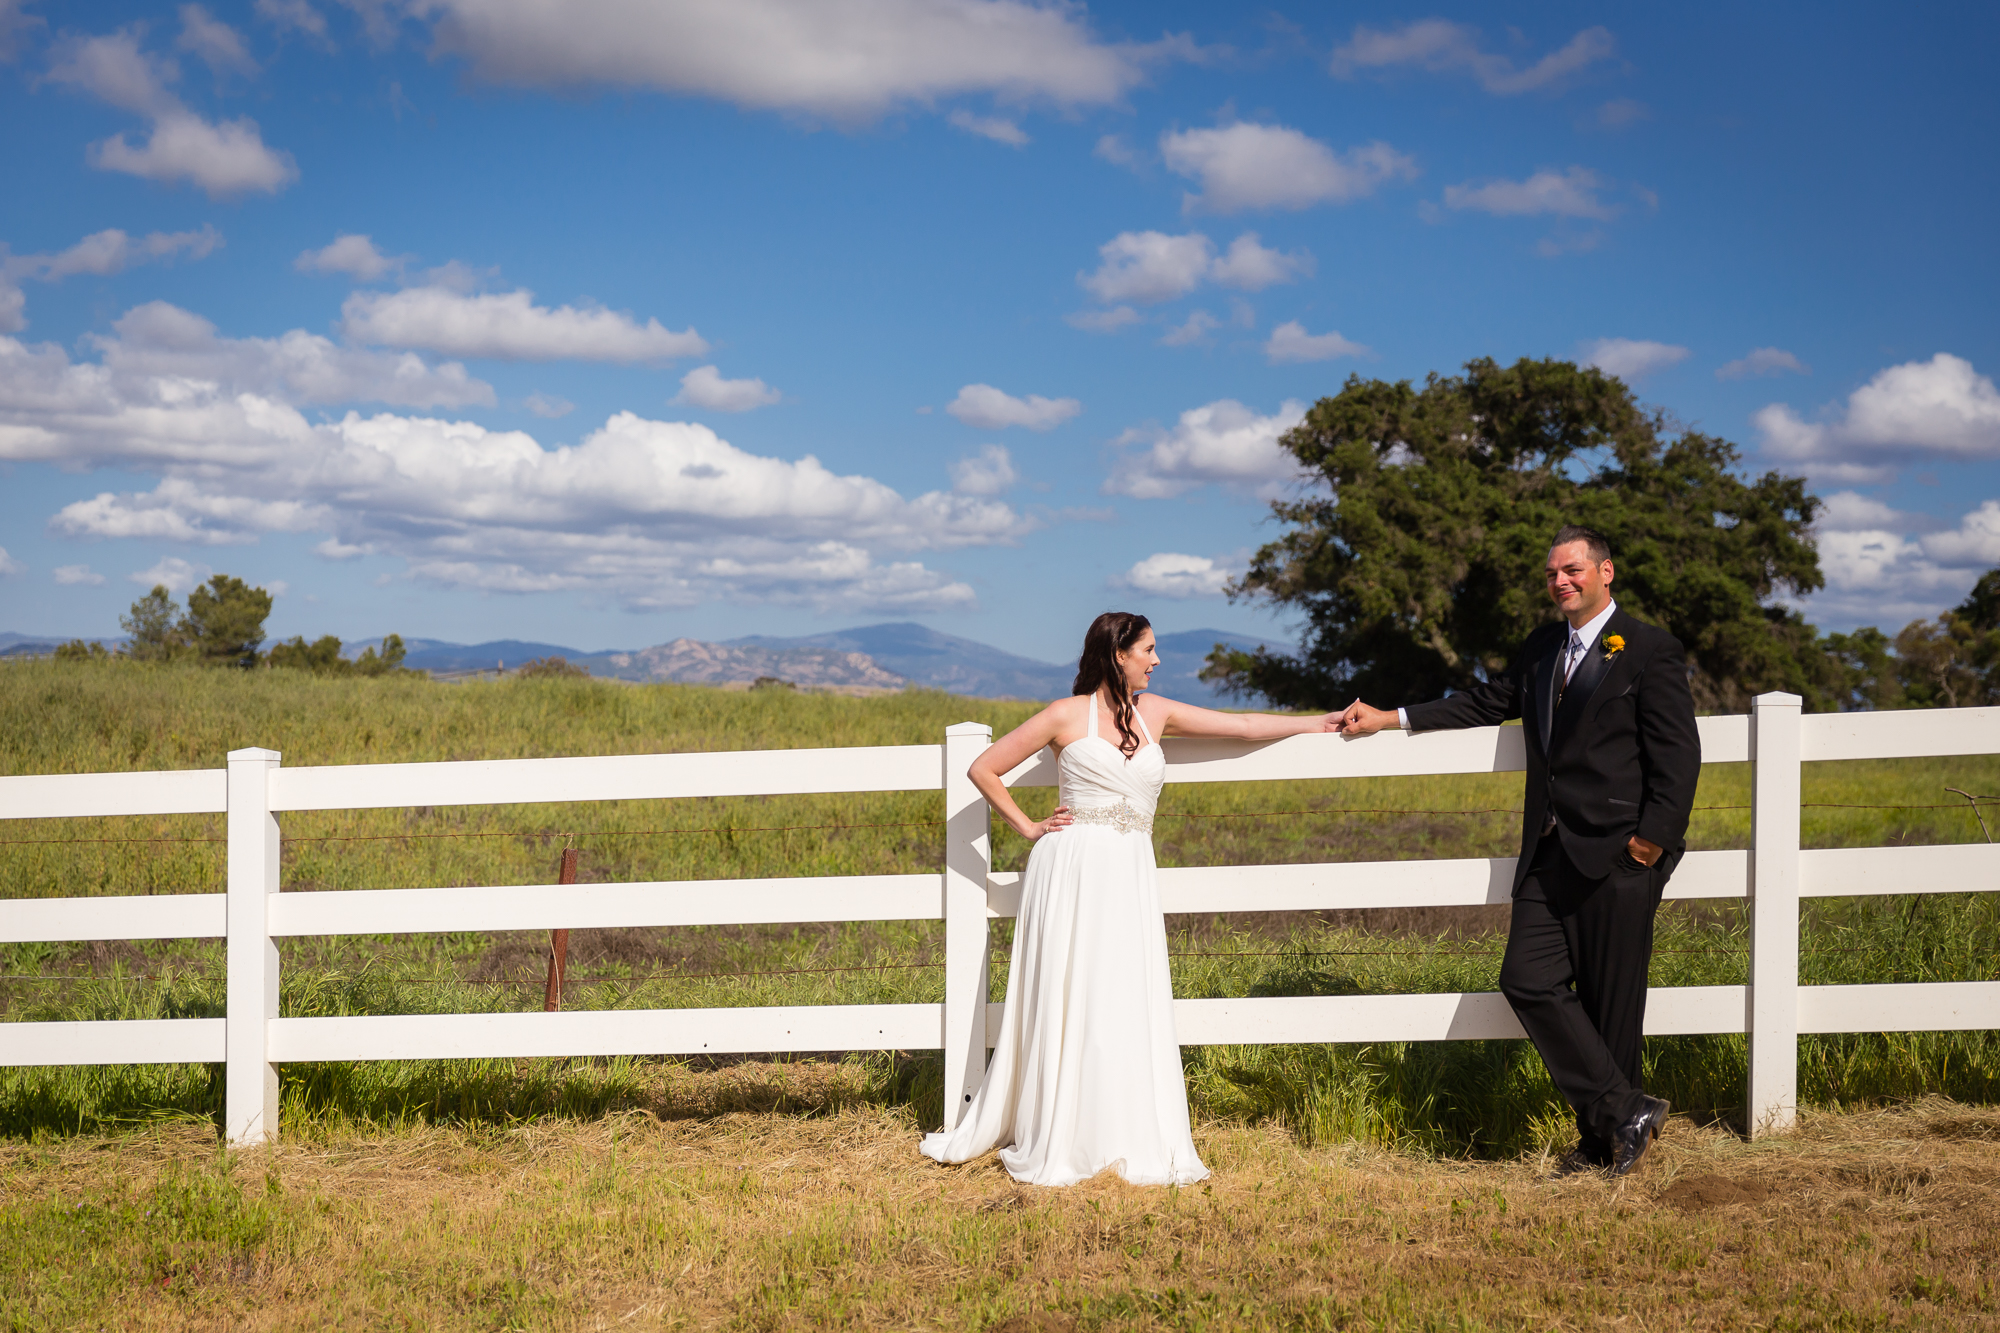 Gary-Kasl-SandKasl-Imaging-Wedding-Photography-37.jpg